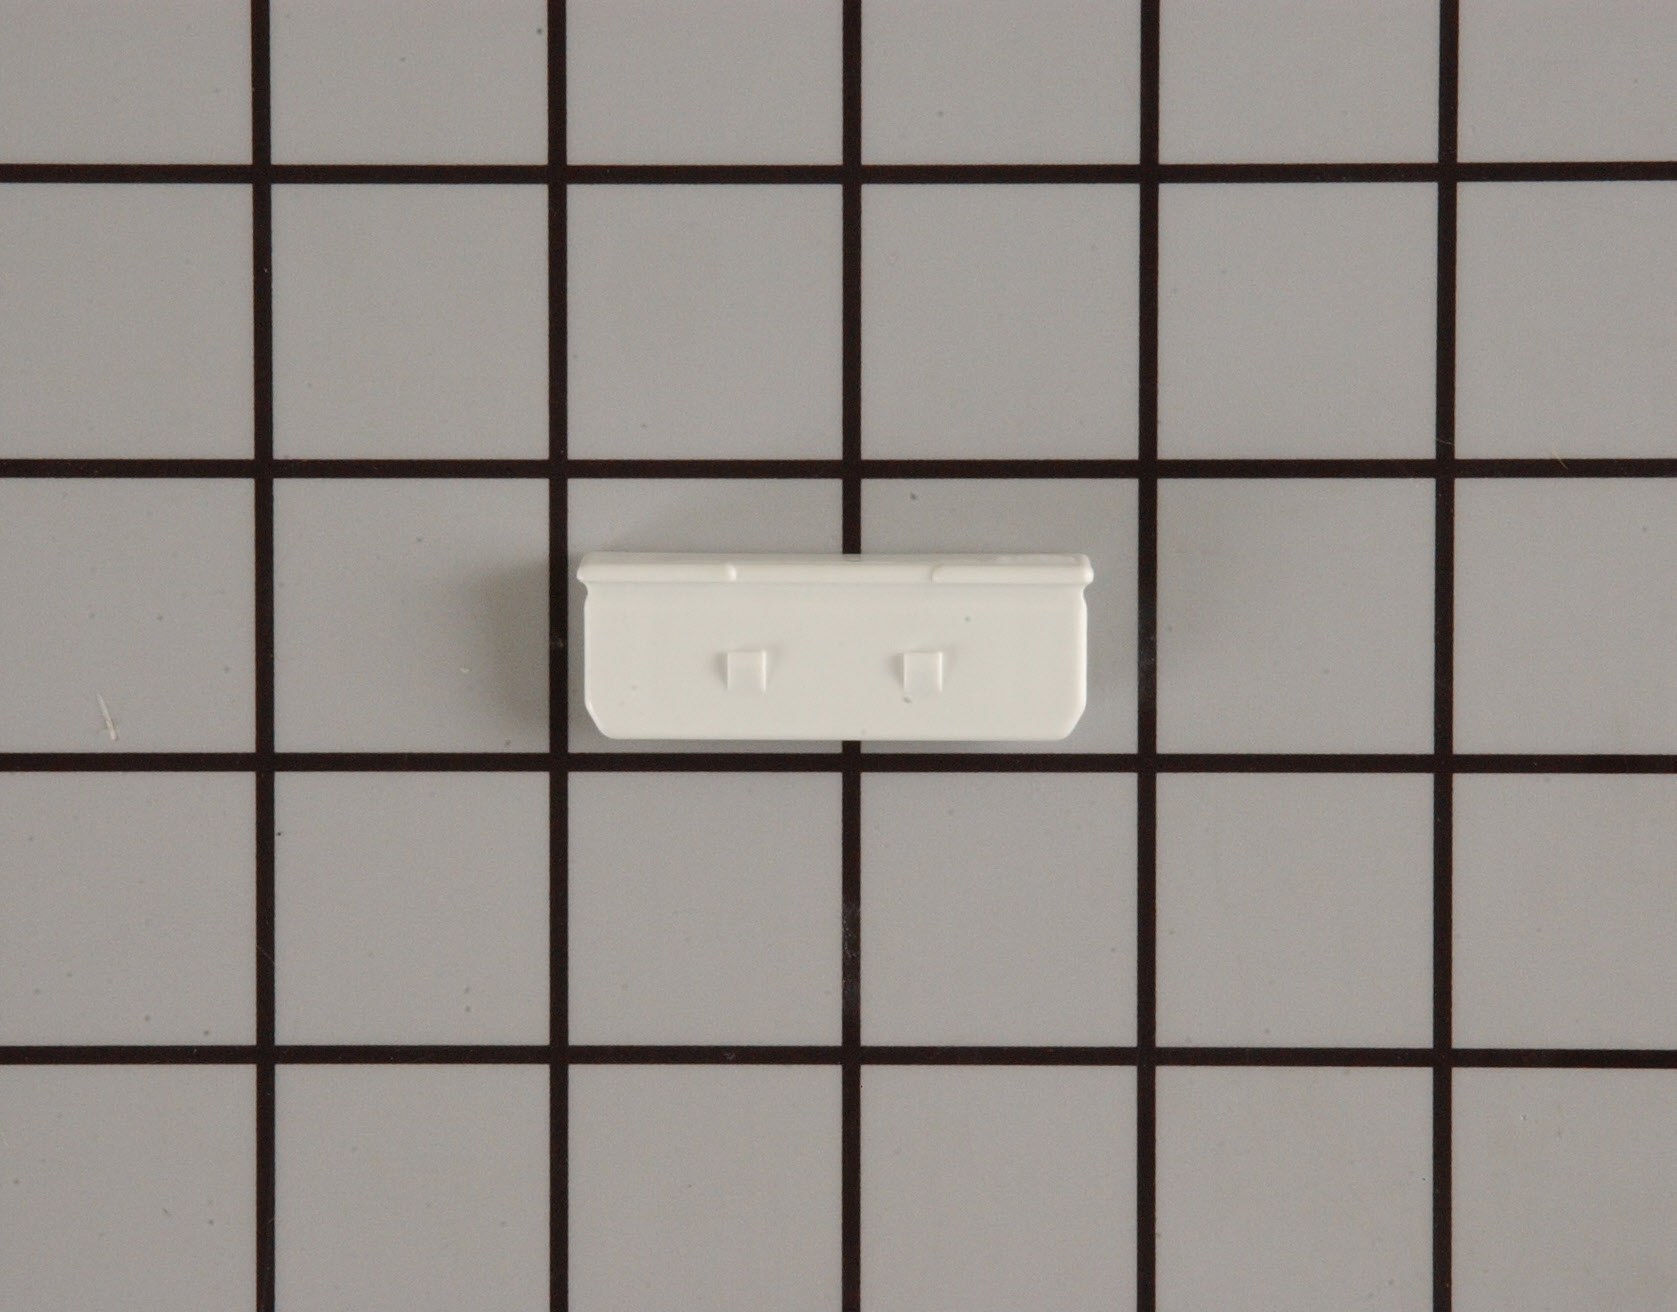 Maytag Refrigerator Part # WP2156006 - Shelf Trim